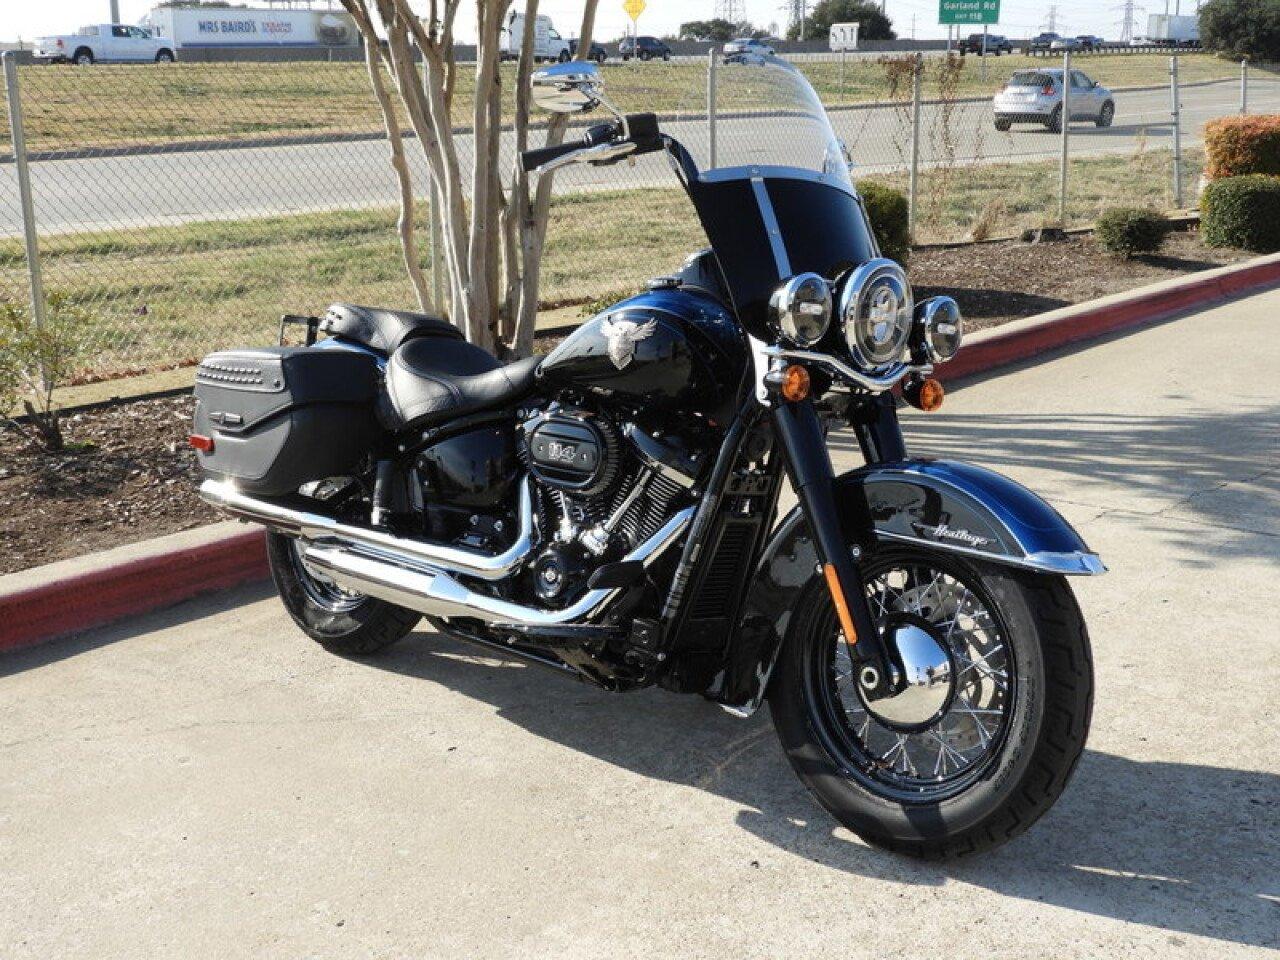 2017 Harley Davidson Motorcycles For Sale Port Arthur Tx >> Honda Motorcycles Of Dallas | 2017/2018/2019 Honda Reviews